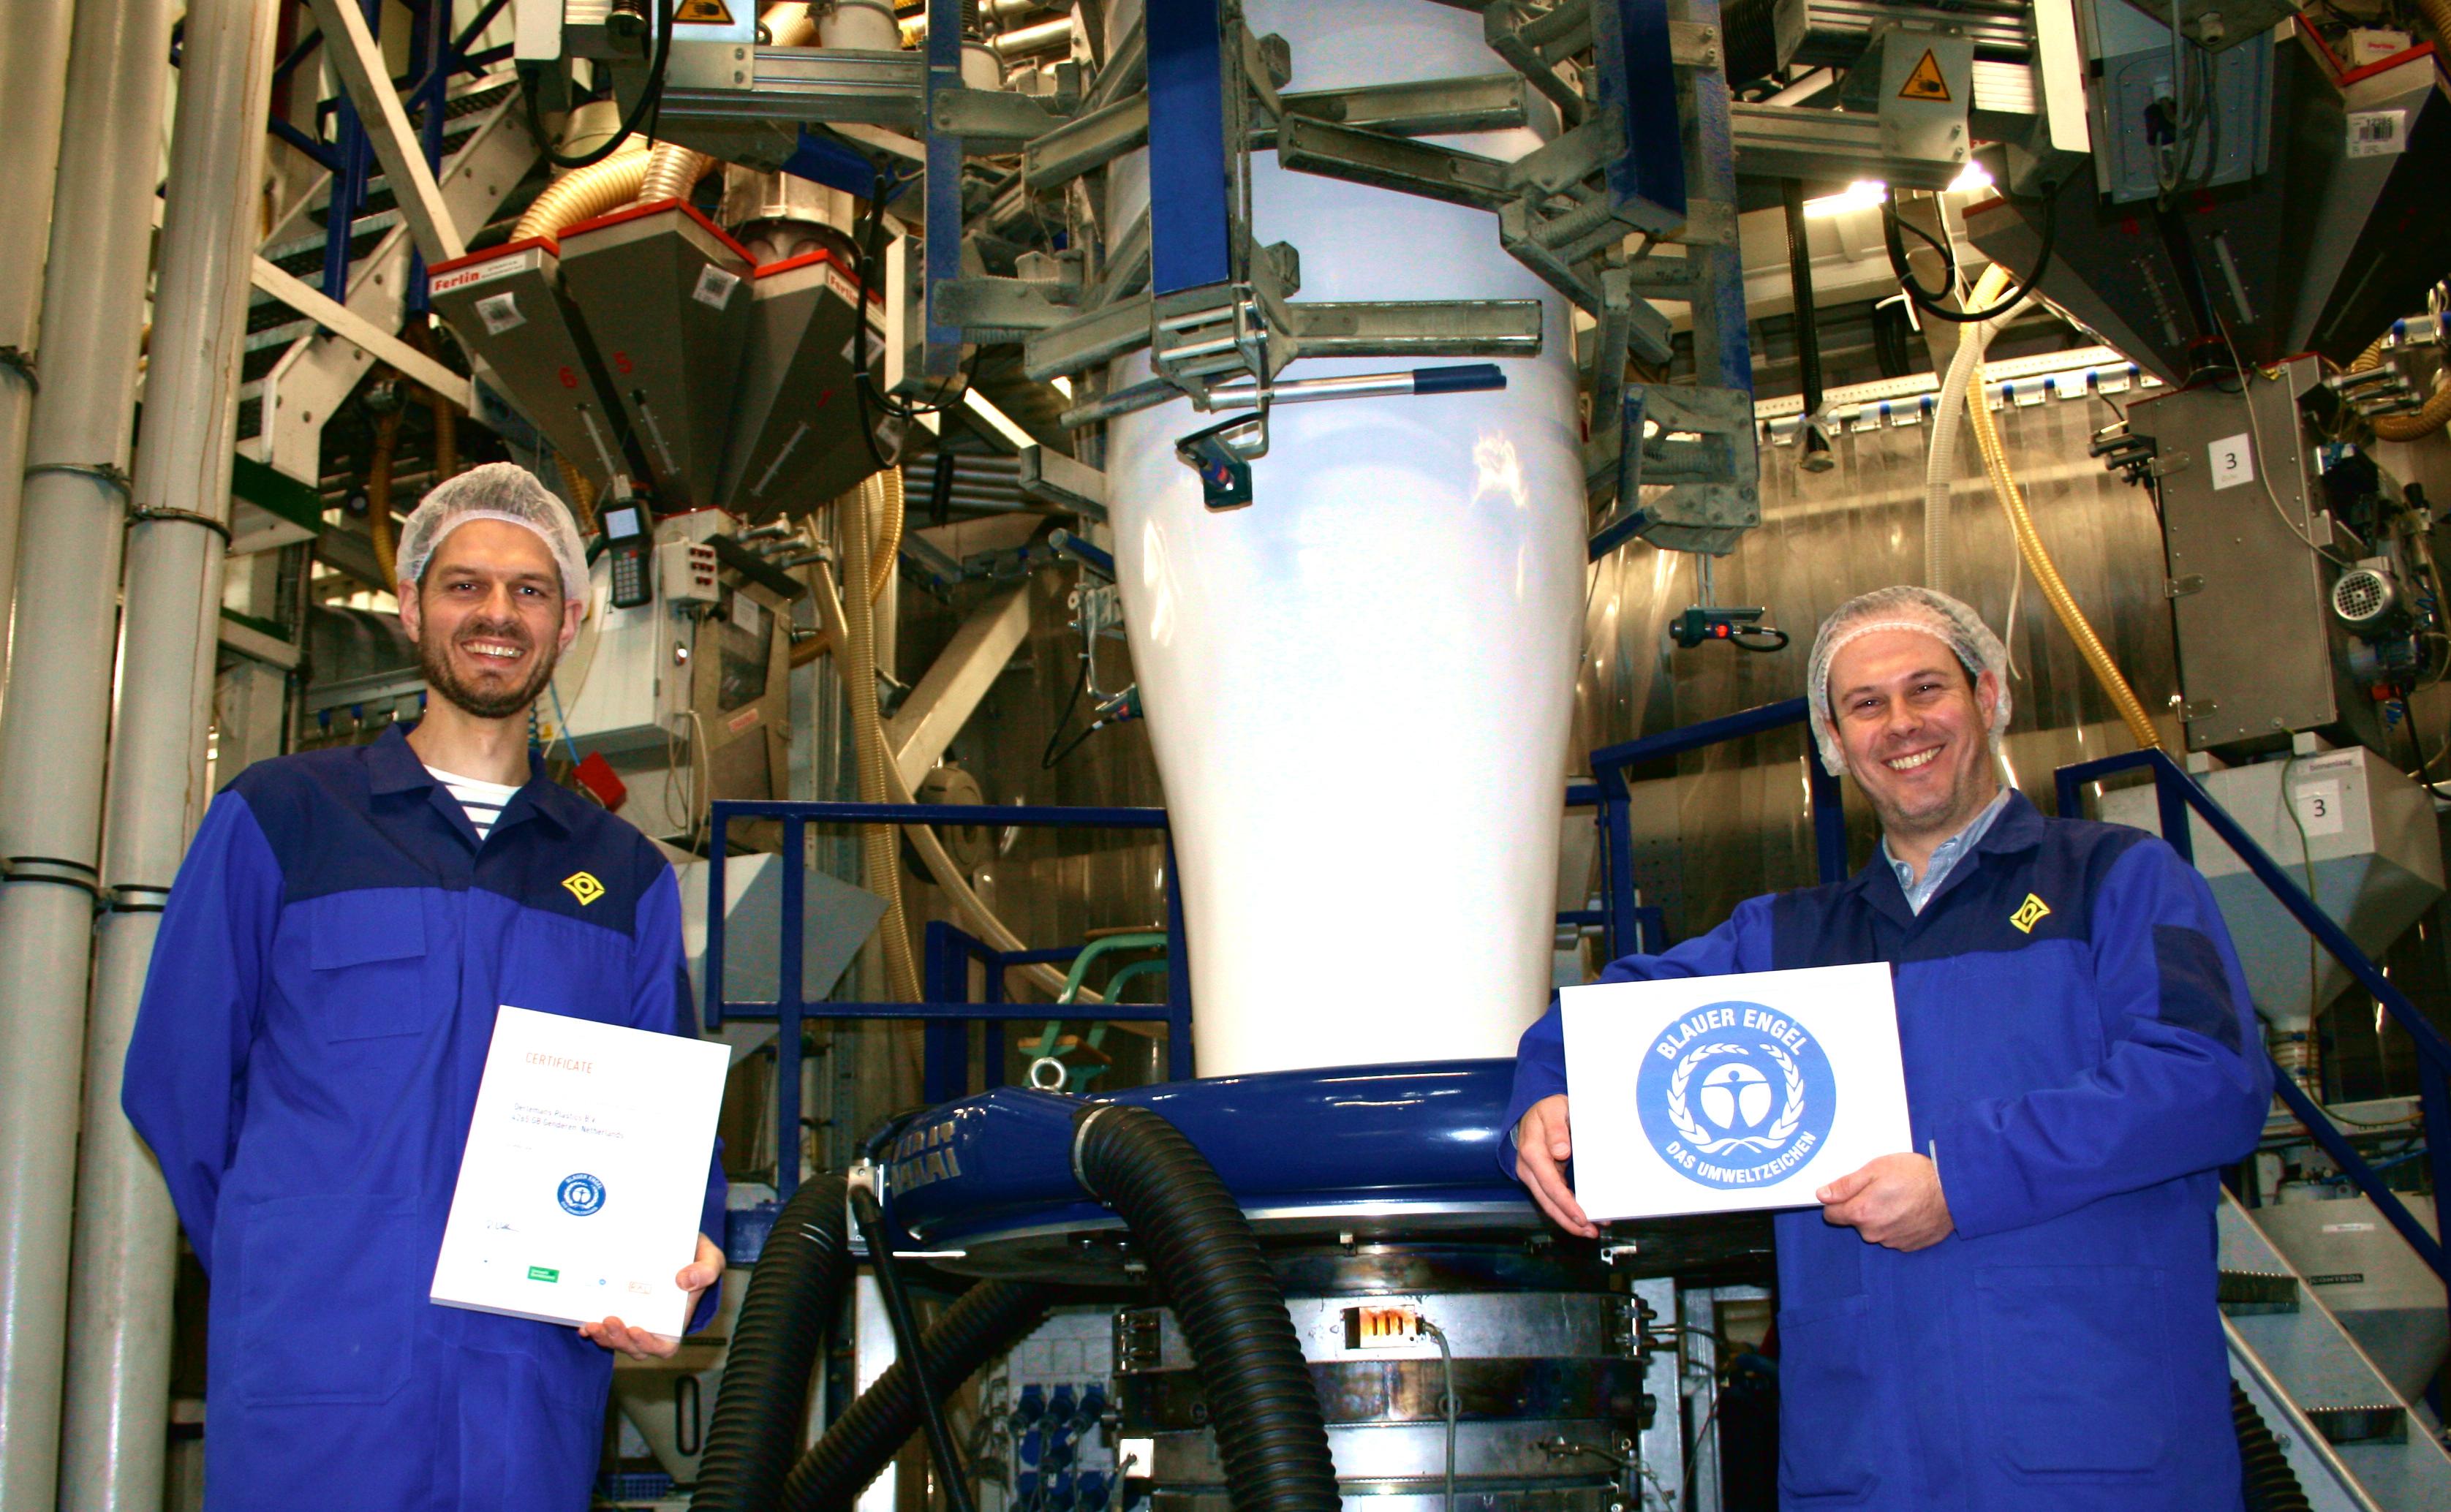 Oerlemans Packaging behaalt ecolabel Blauer Engel